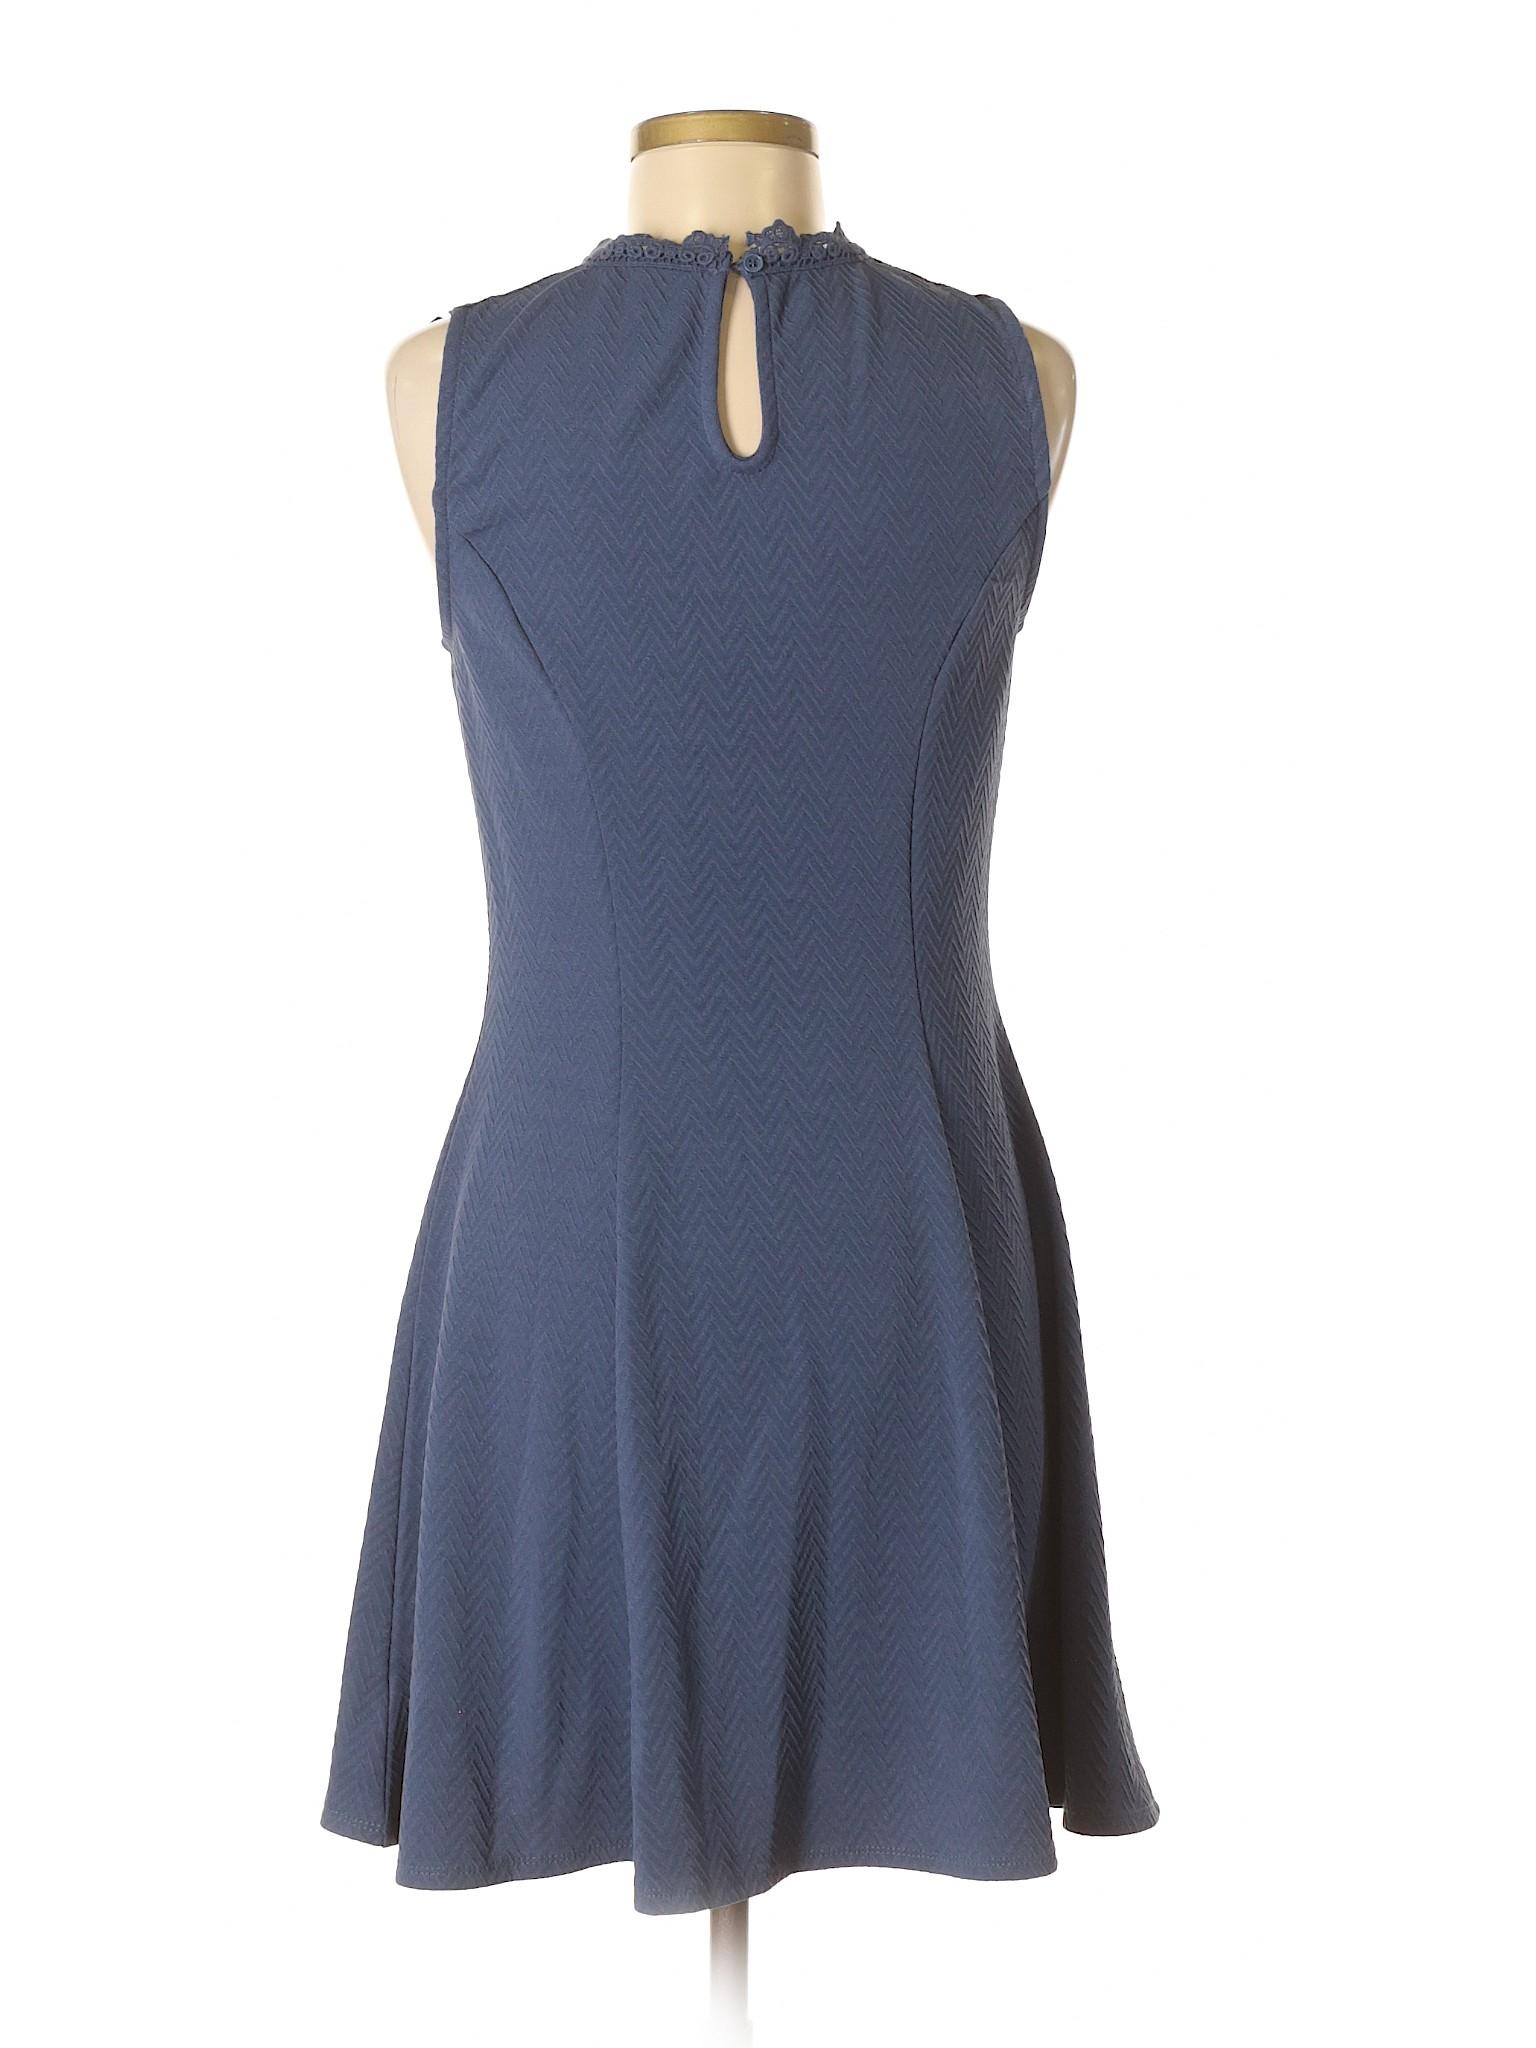 Dress winter Boutique Casual winter Alya Boutique Alya tqx0w85YO